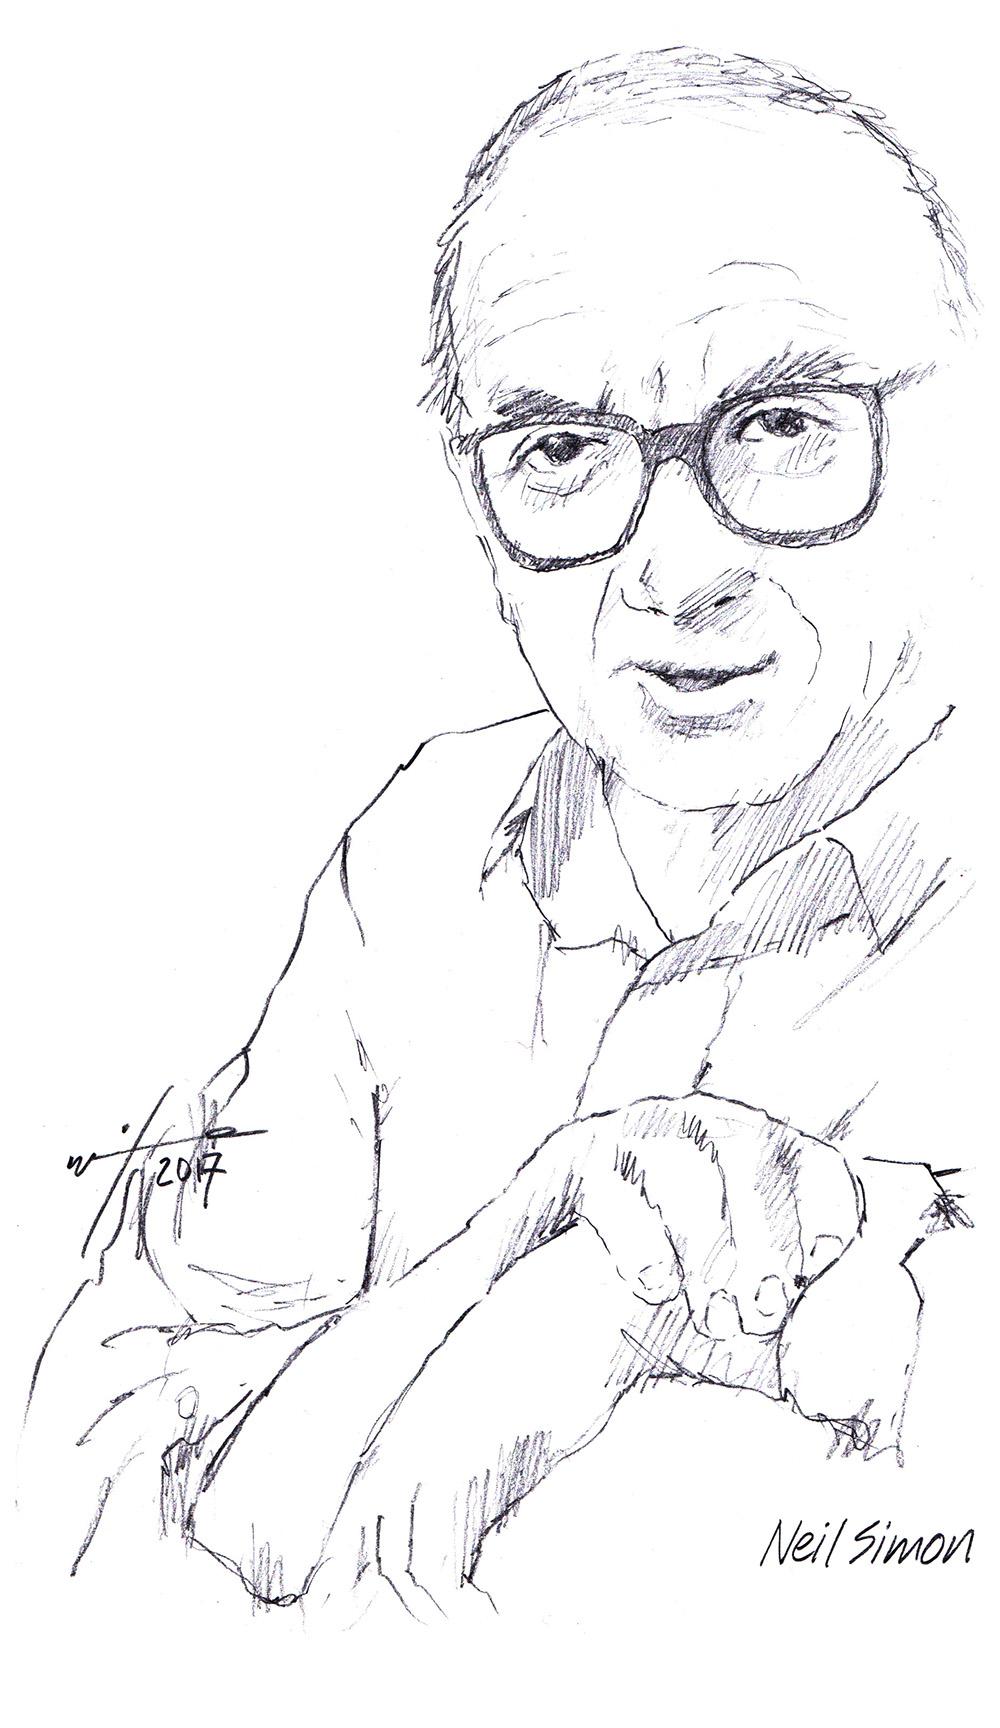 Drawing of writer Neil Simon